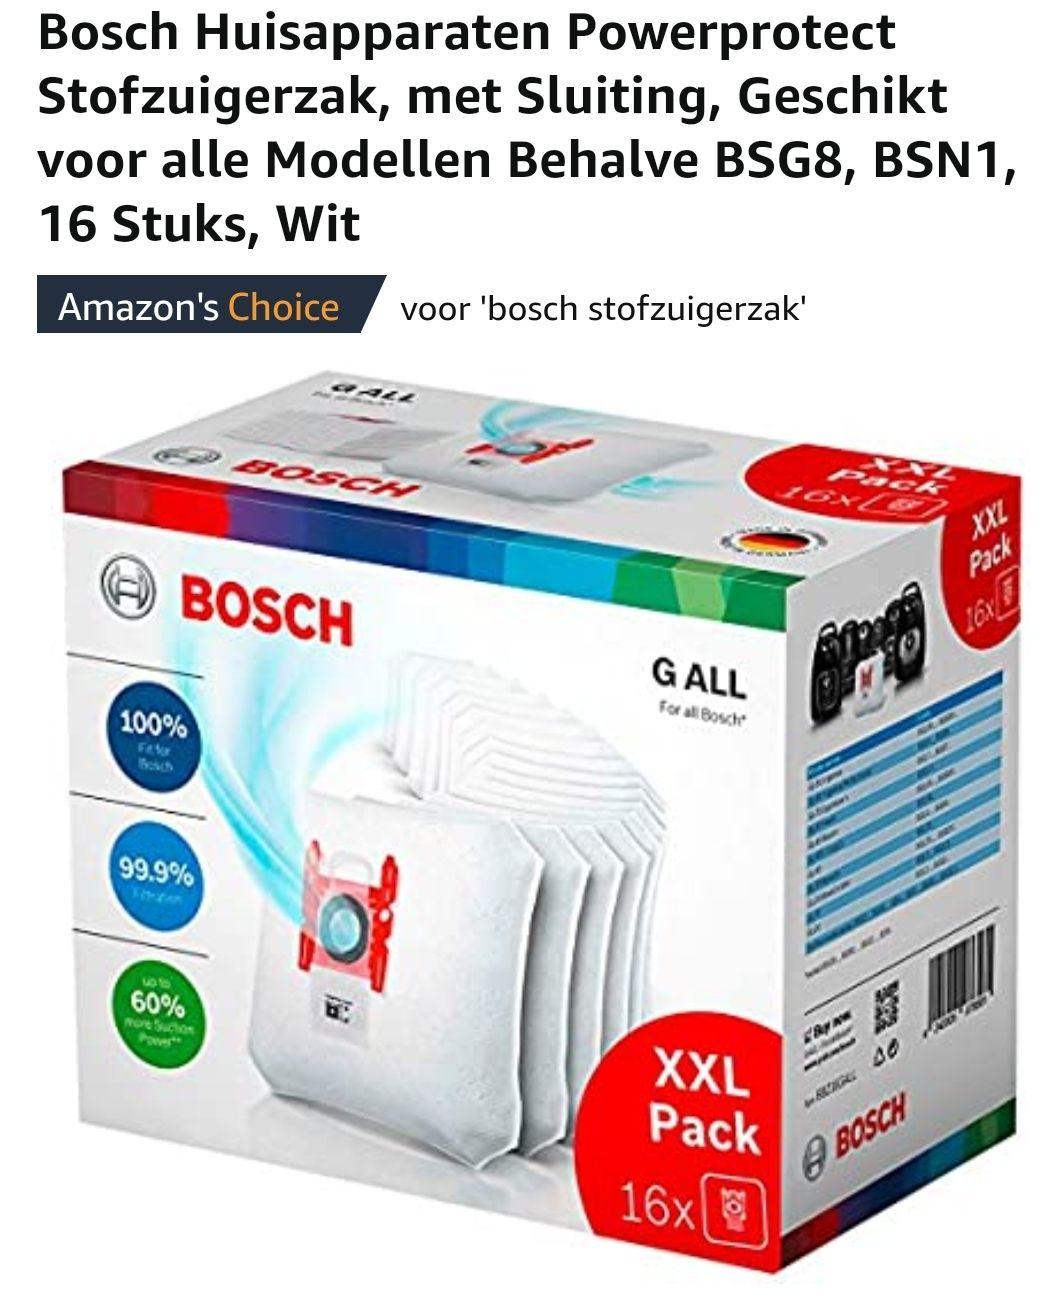 Bosch stofzuigerzakken XXL (16 stuks) bij Amazon.nl